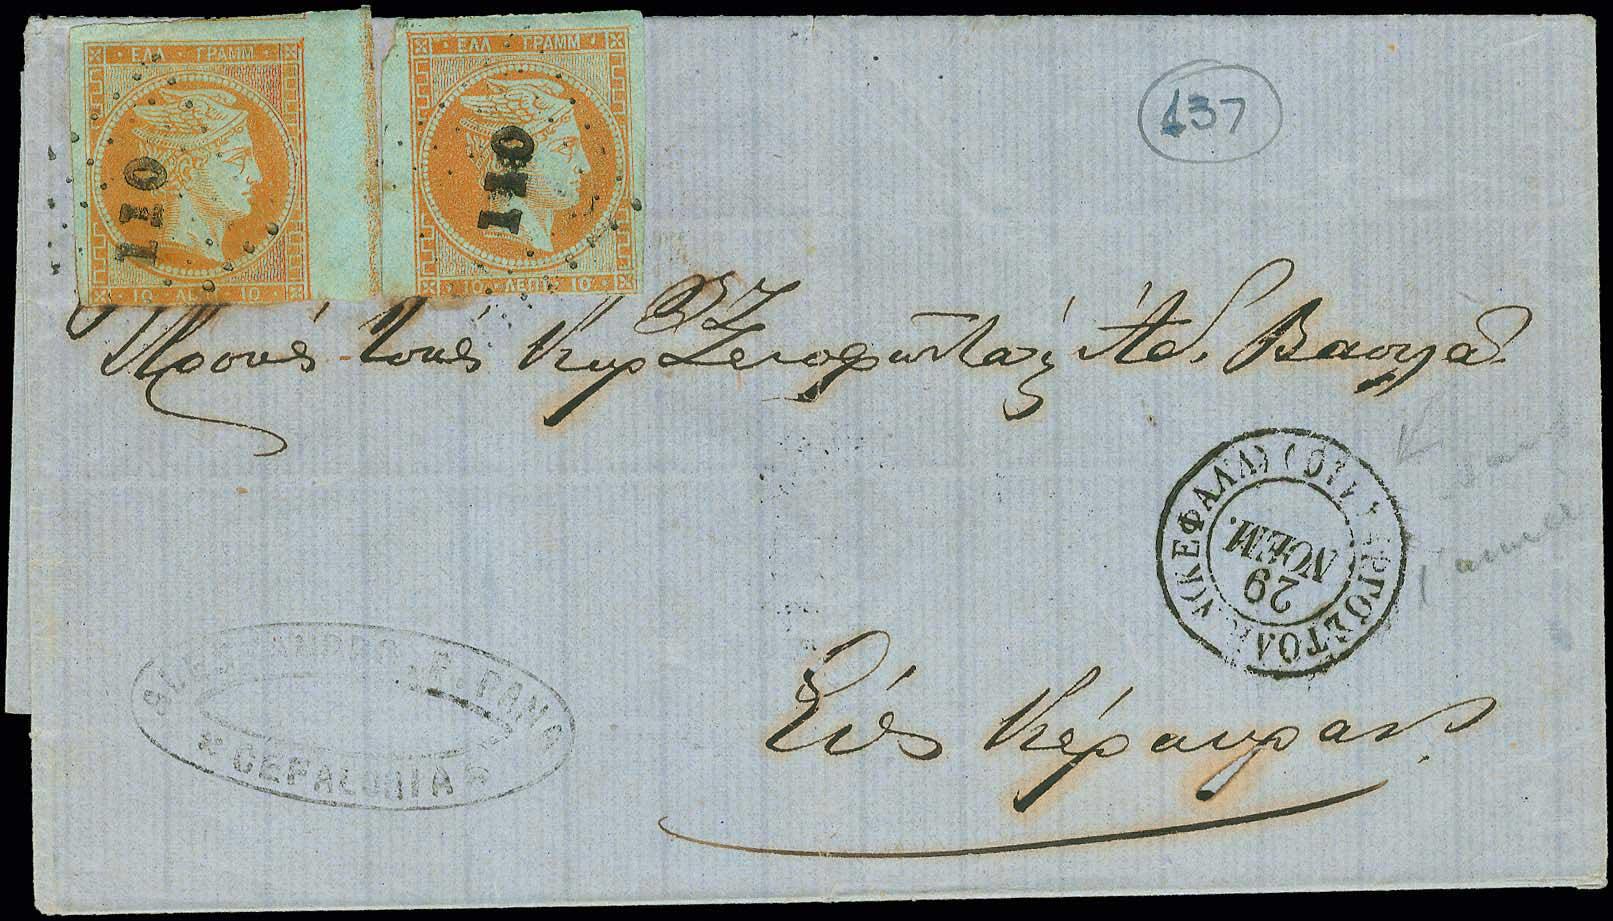 Lot 74 - -  LARGE HERMES HEAD 1862/67 consecutive athens printings -  A. Karamitsos Public & Live Internet Auction 673